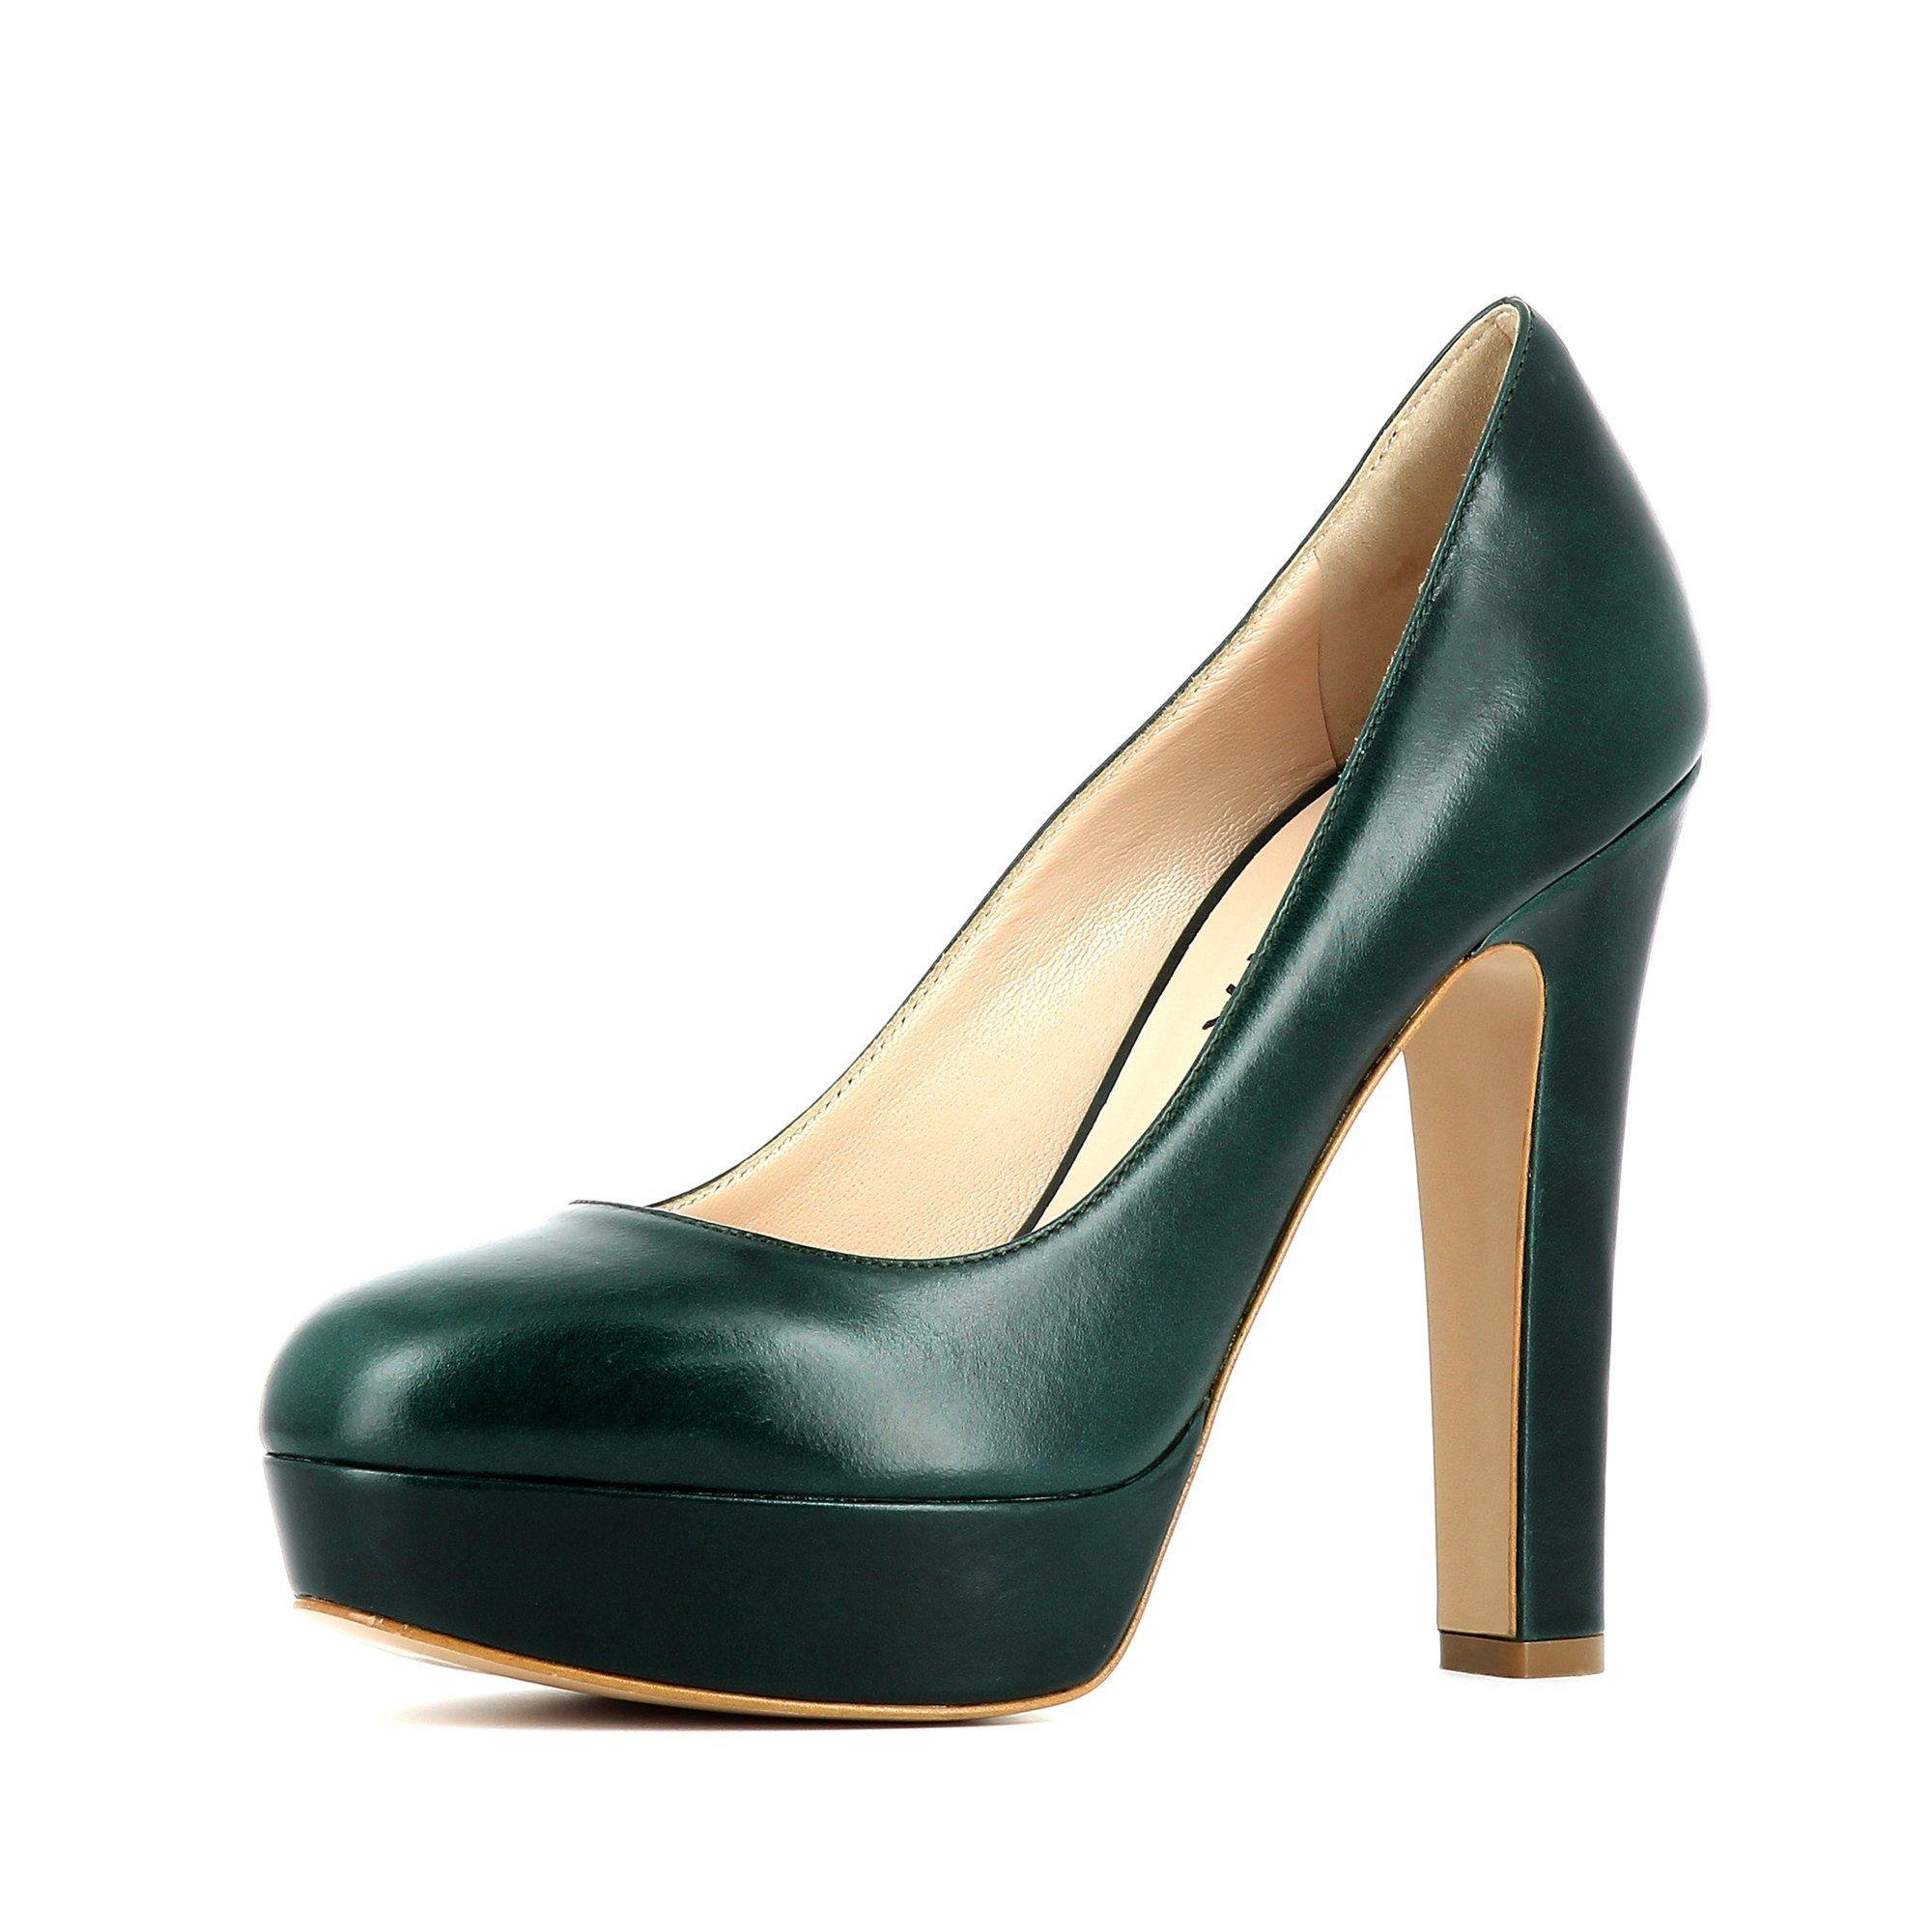 Evita RICCARDA Pumps, High-Heel-Pumps kaufen  dunkelgrün